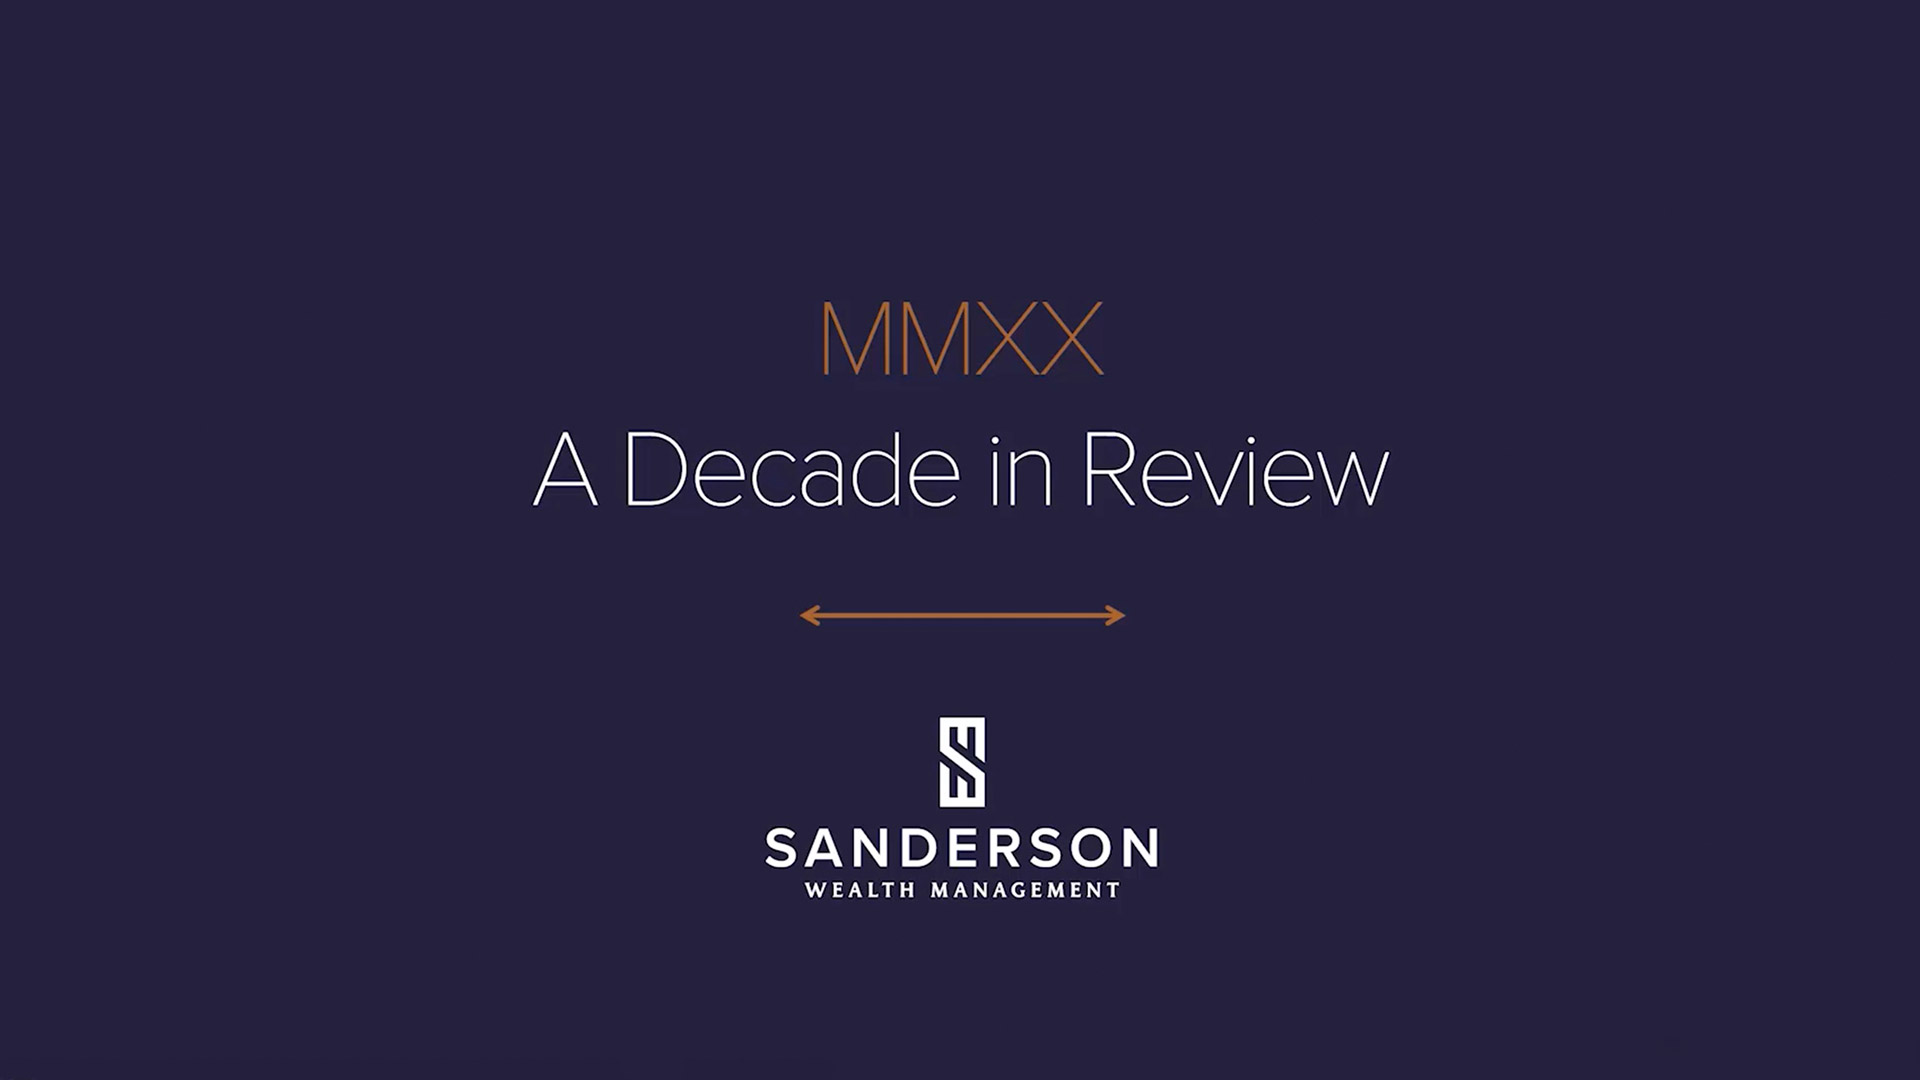 John-Sanderson-Decade-in-Review-Feb-2020